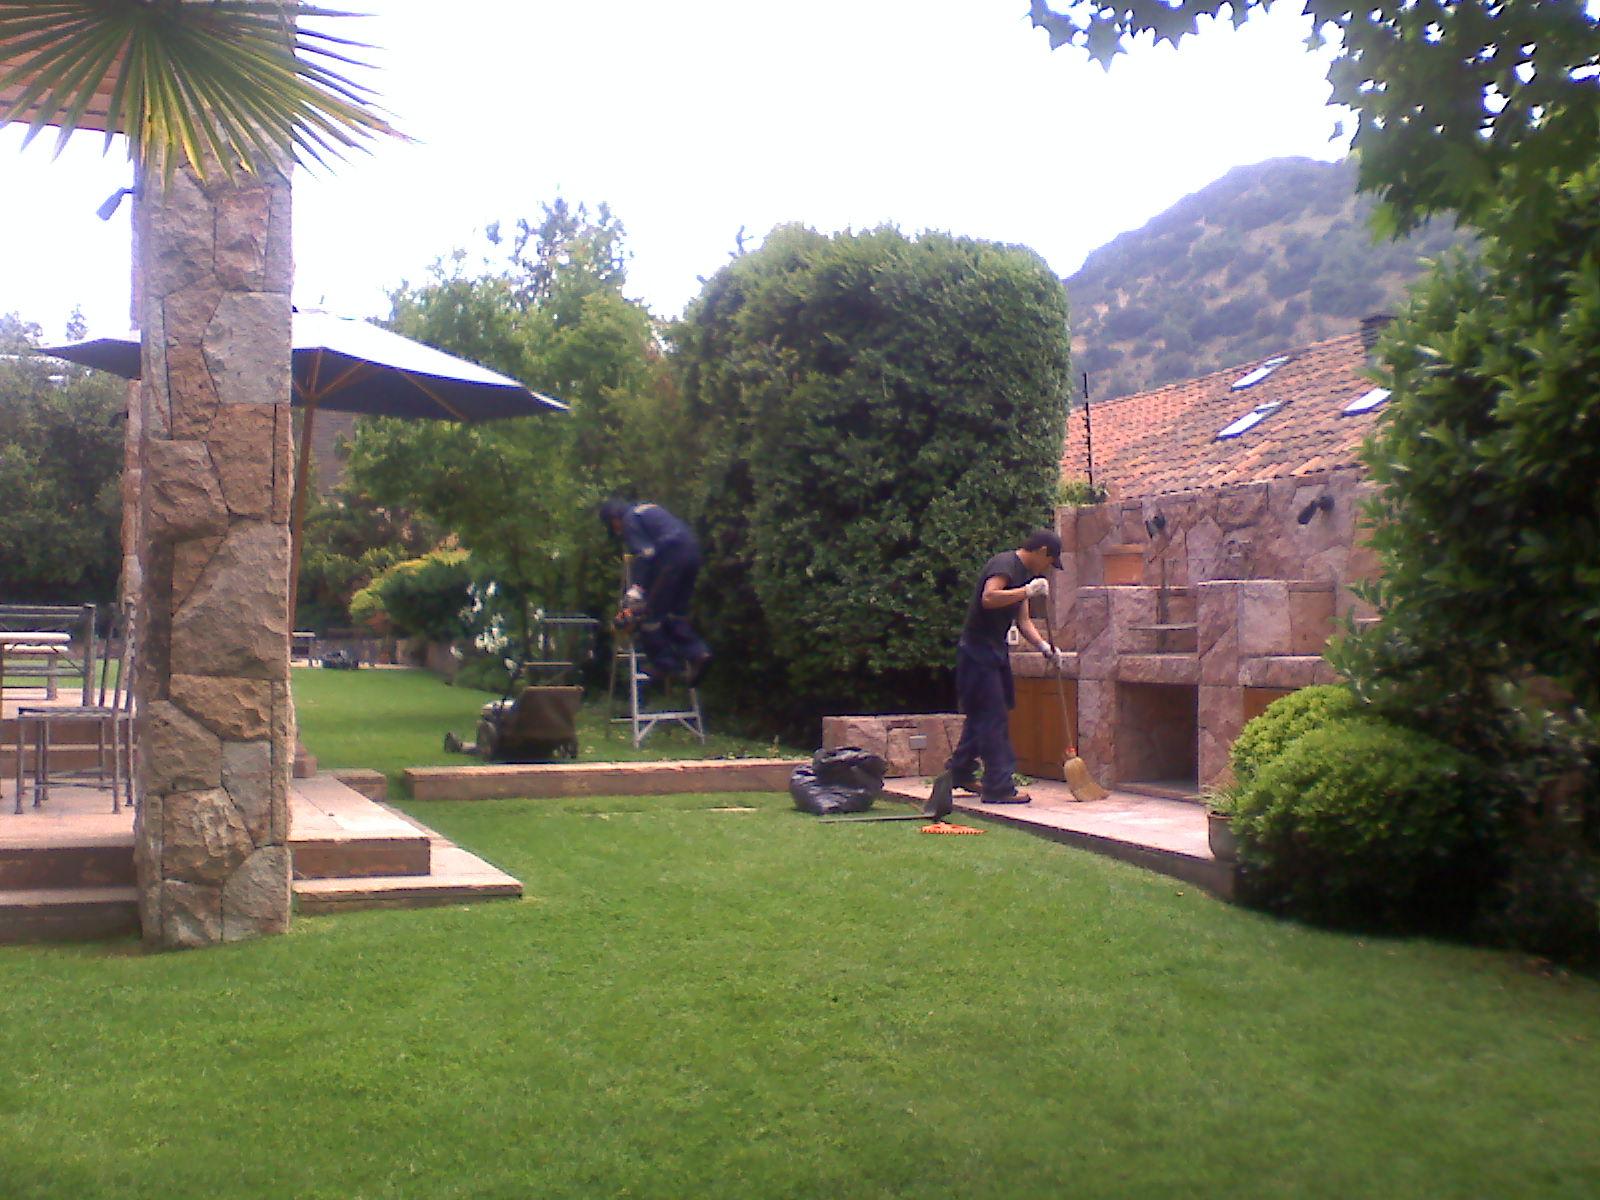 Darrigrandi y simunovic jardineria semillas o cesped alfombra - Cuando plantar cesped ...